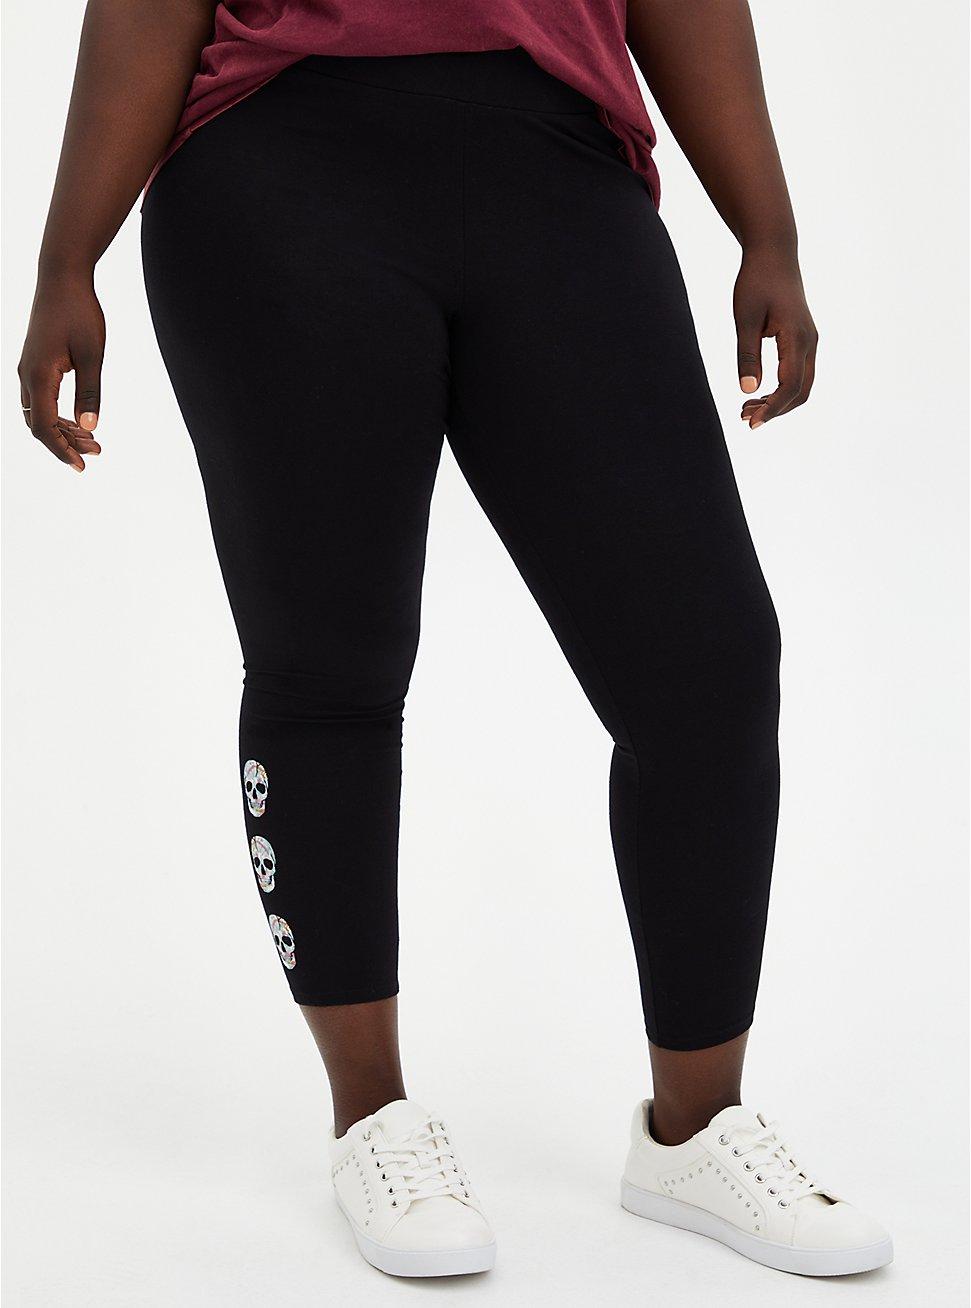 Crop Premium Legging Tie-Dye Skull Side - Black, BLACK, hi-res